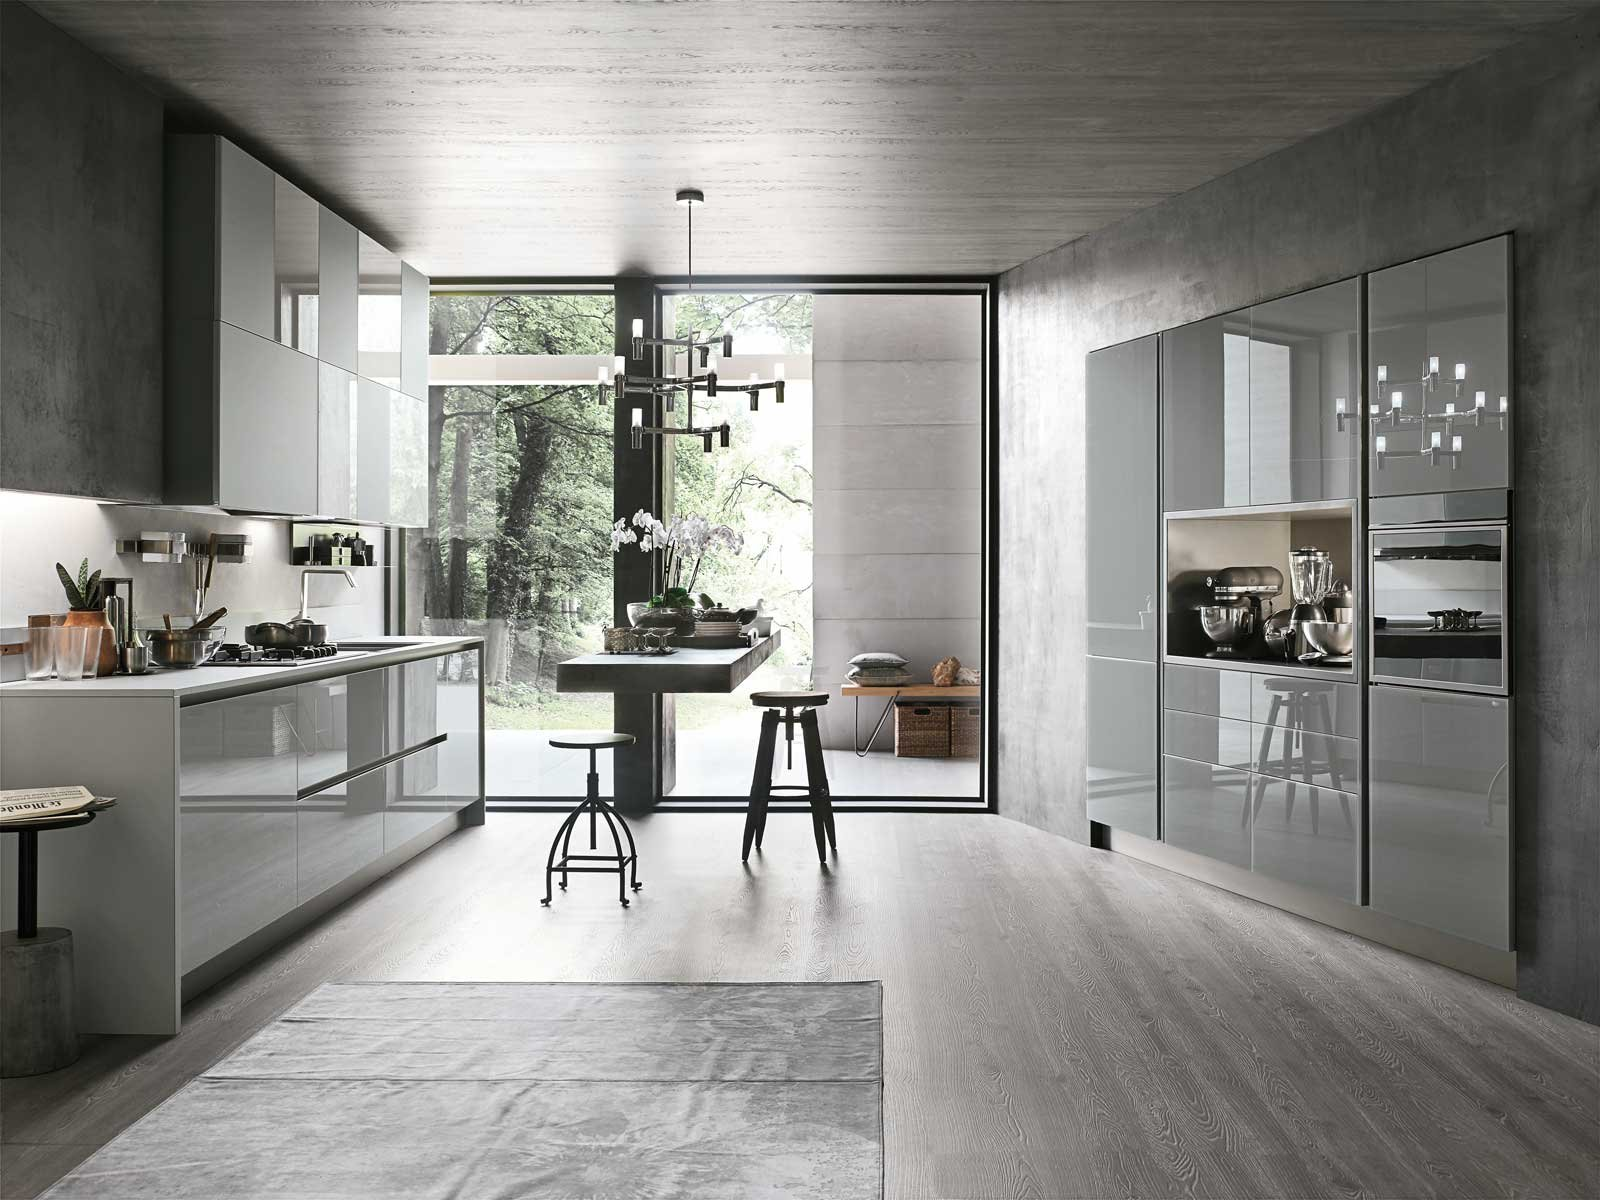 Cucine in vetro laccato cose di casa - Cucine foto moderne ...